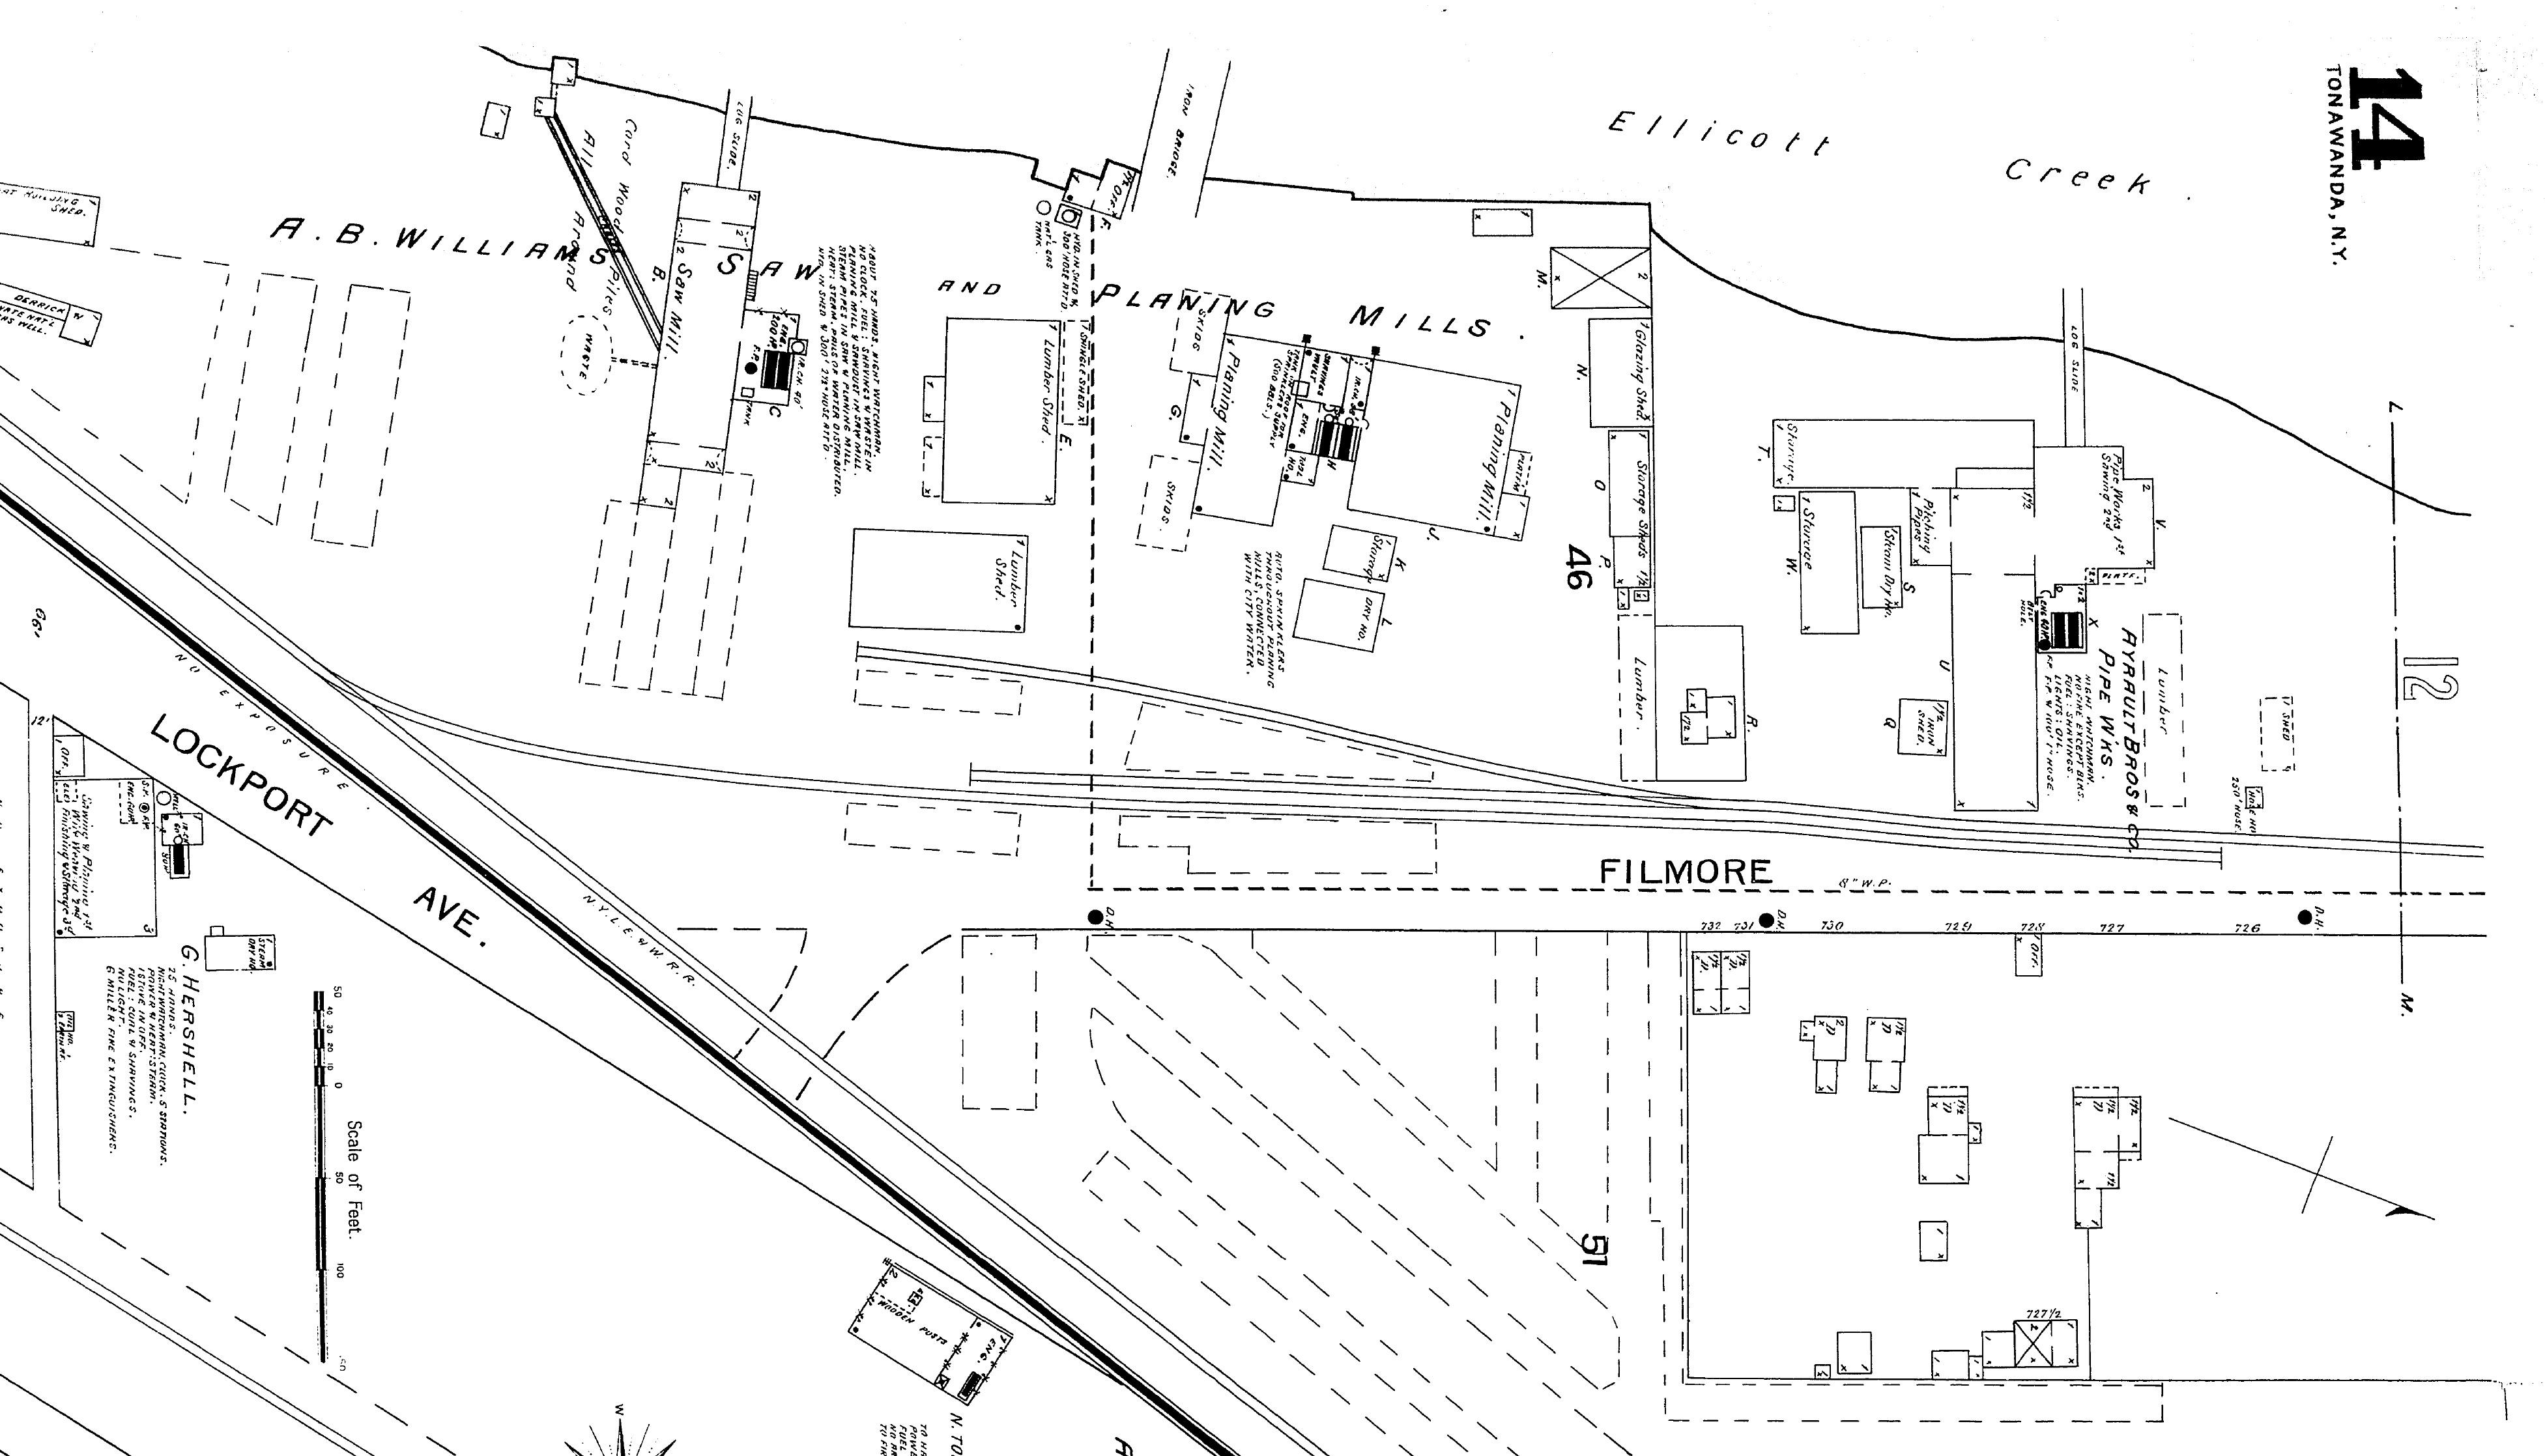 A. B. Williams Planing Mill, Tonawanda (Sanborn Map Co., 1893).jpg